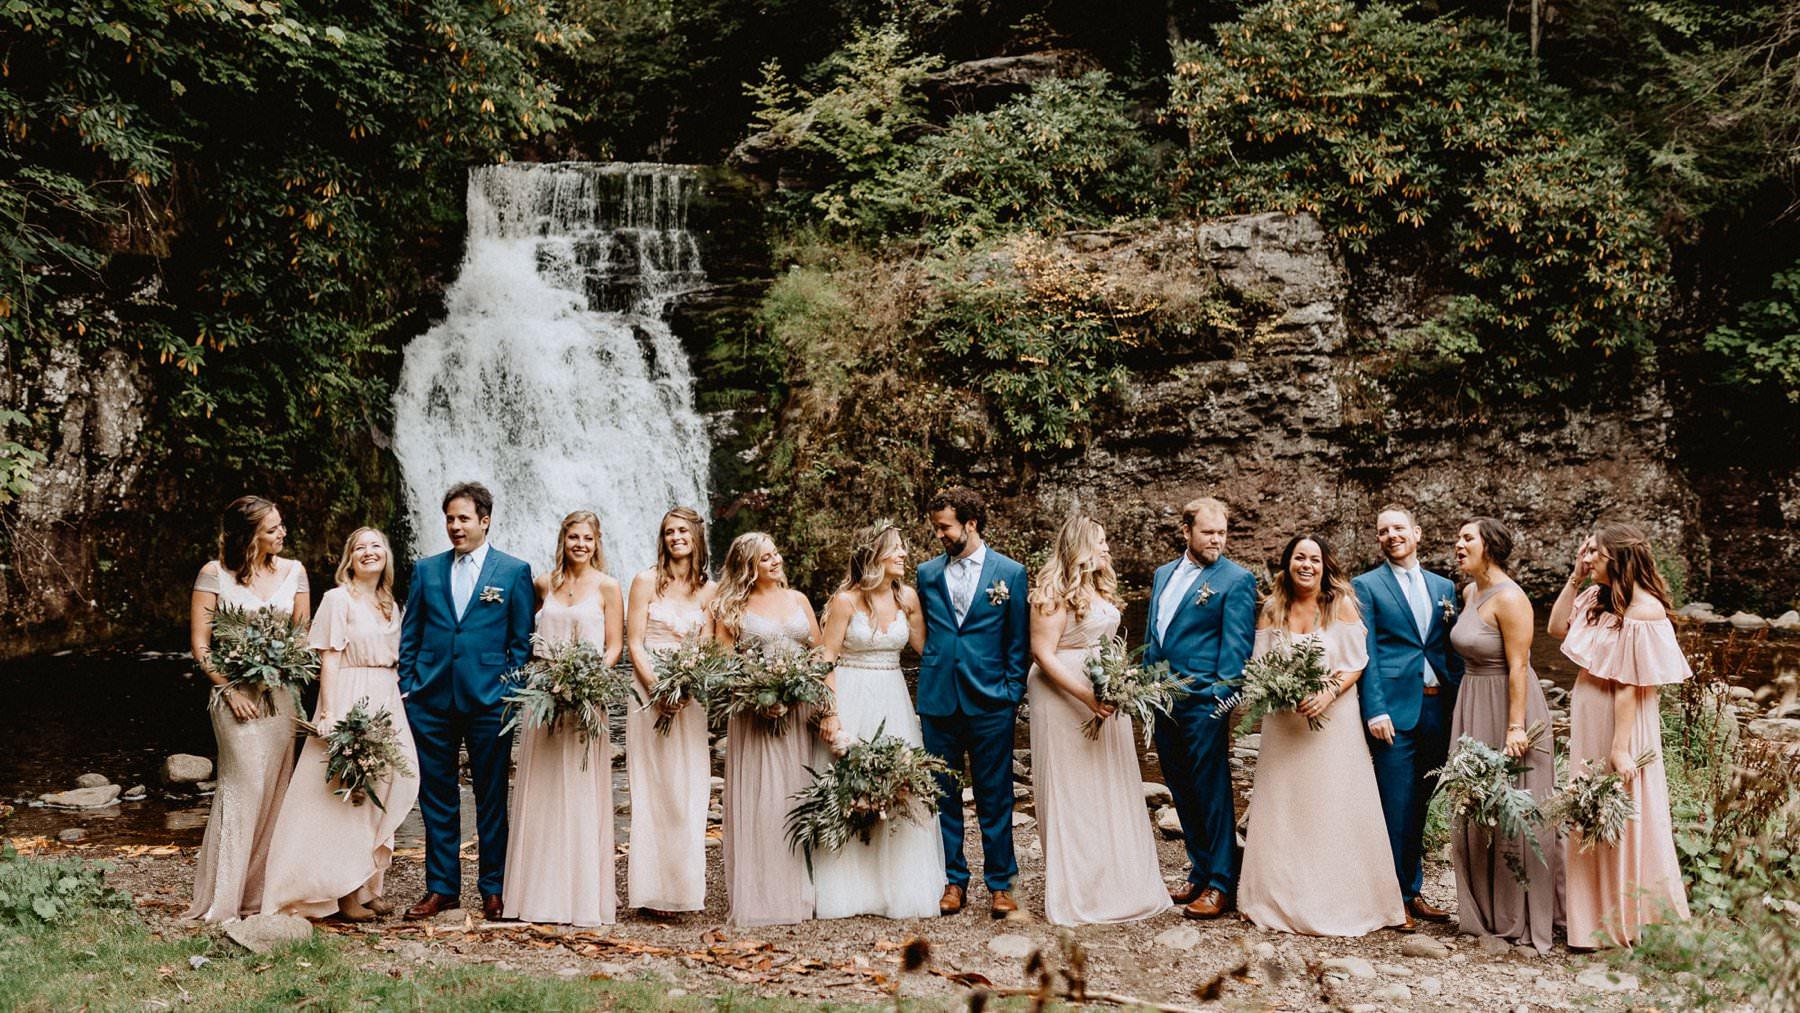 021-Tall-timber-barn-wedding-22.jpg